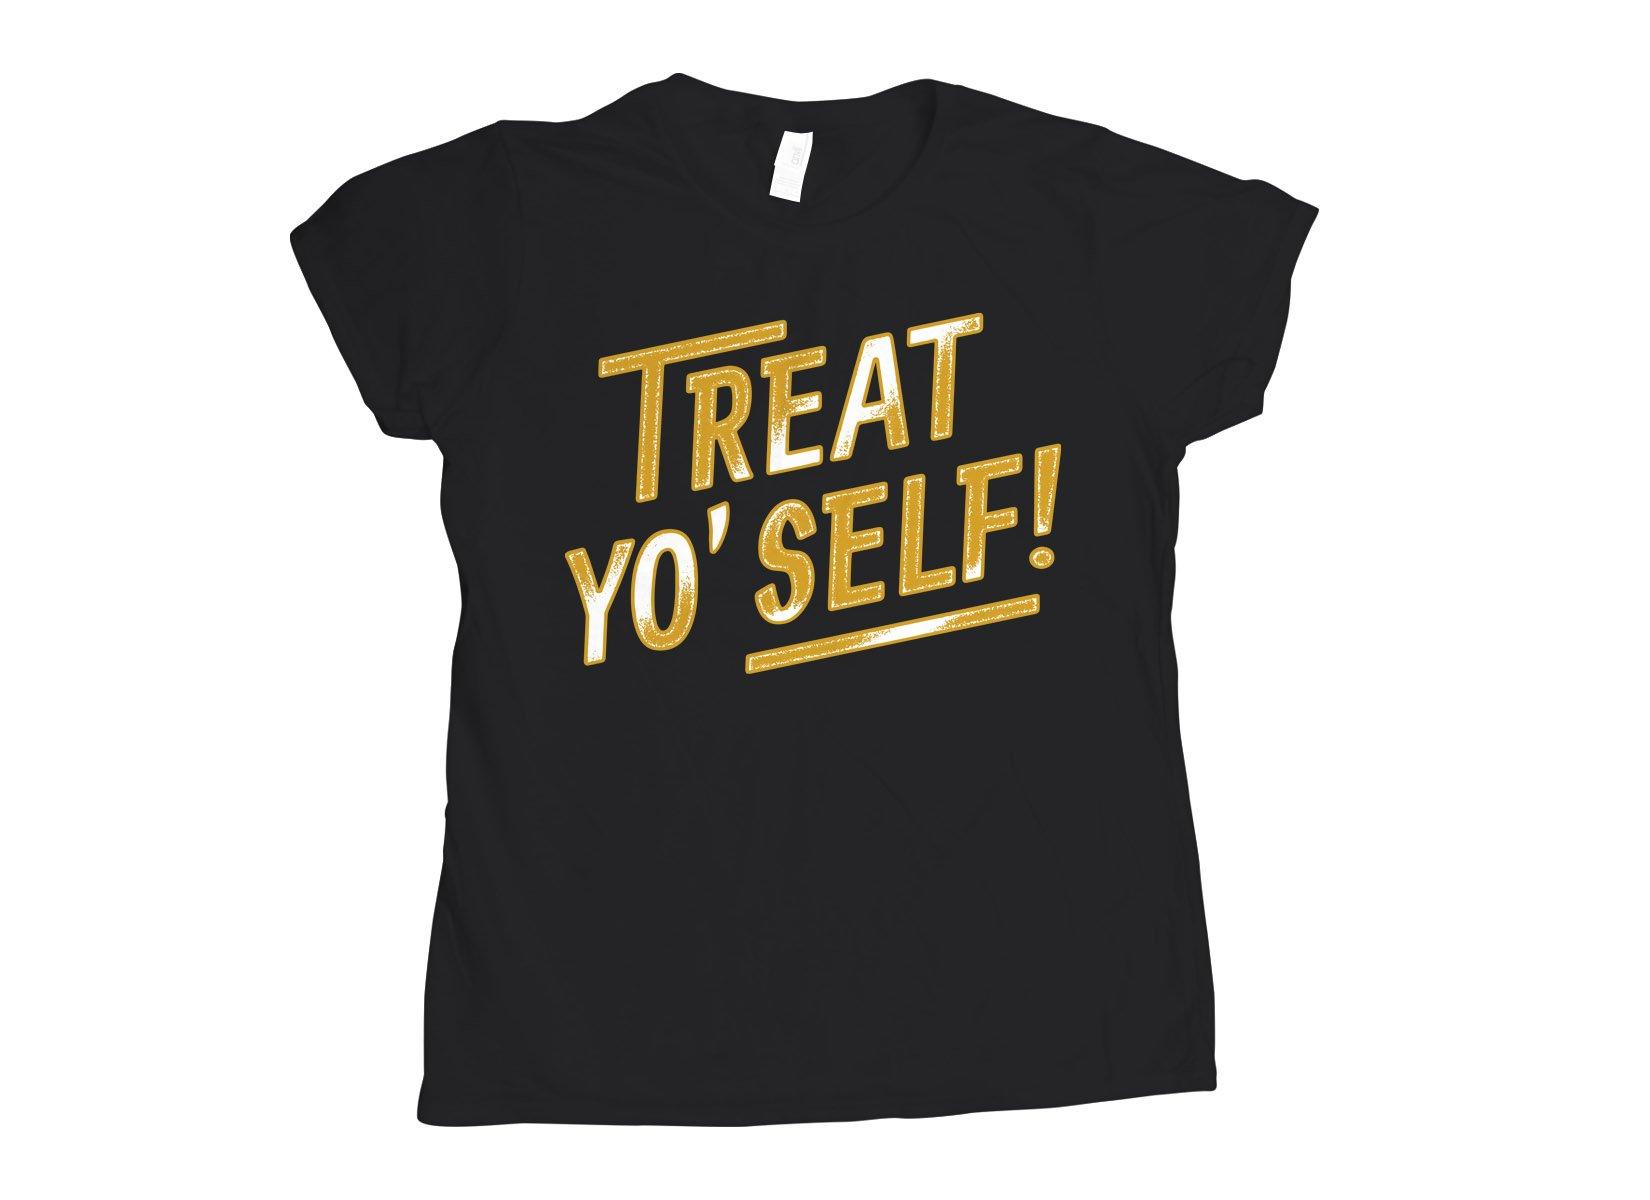 Treat Yo' Self! on Womens T-Shirt